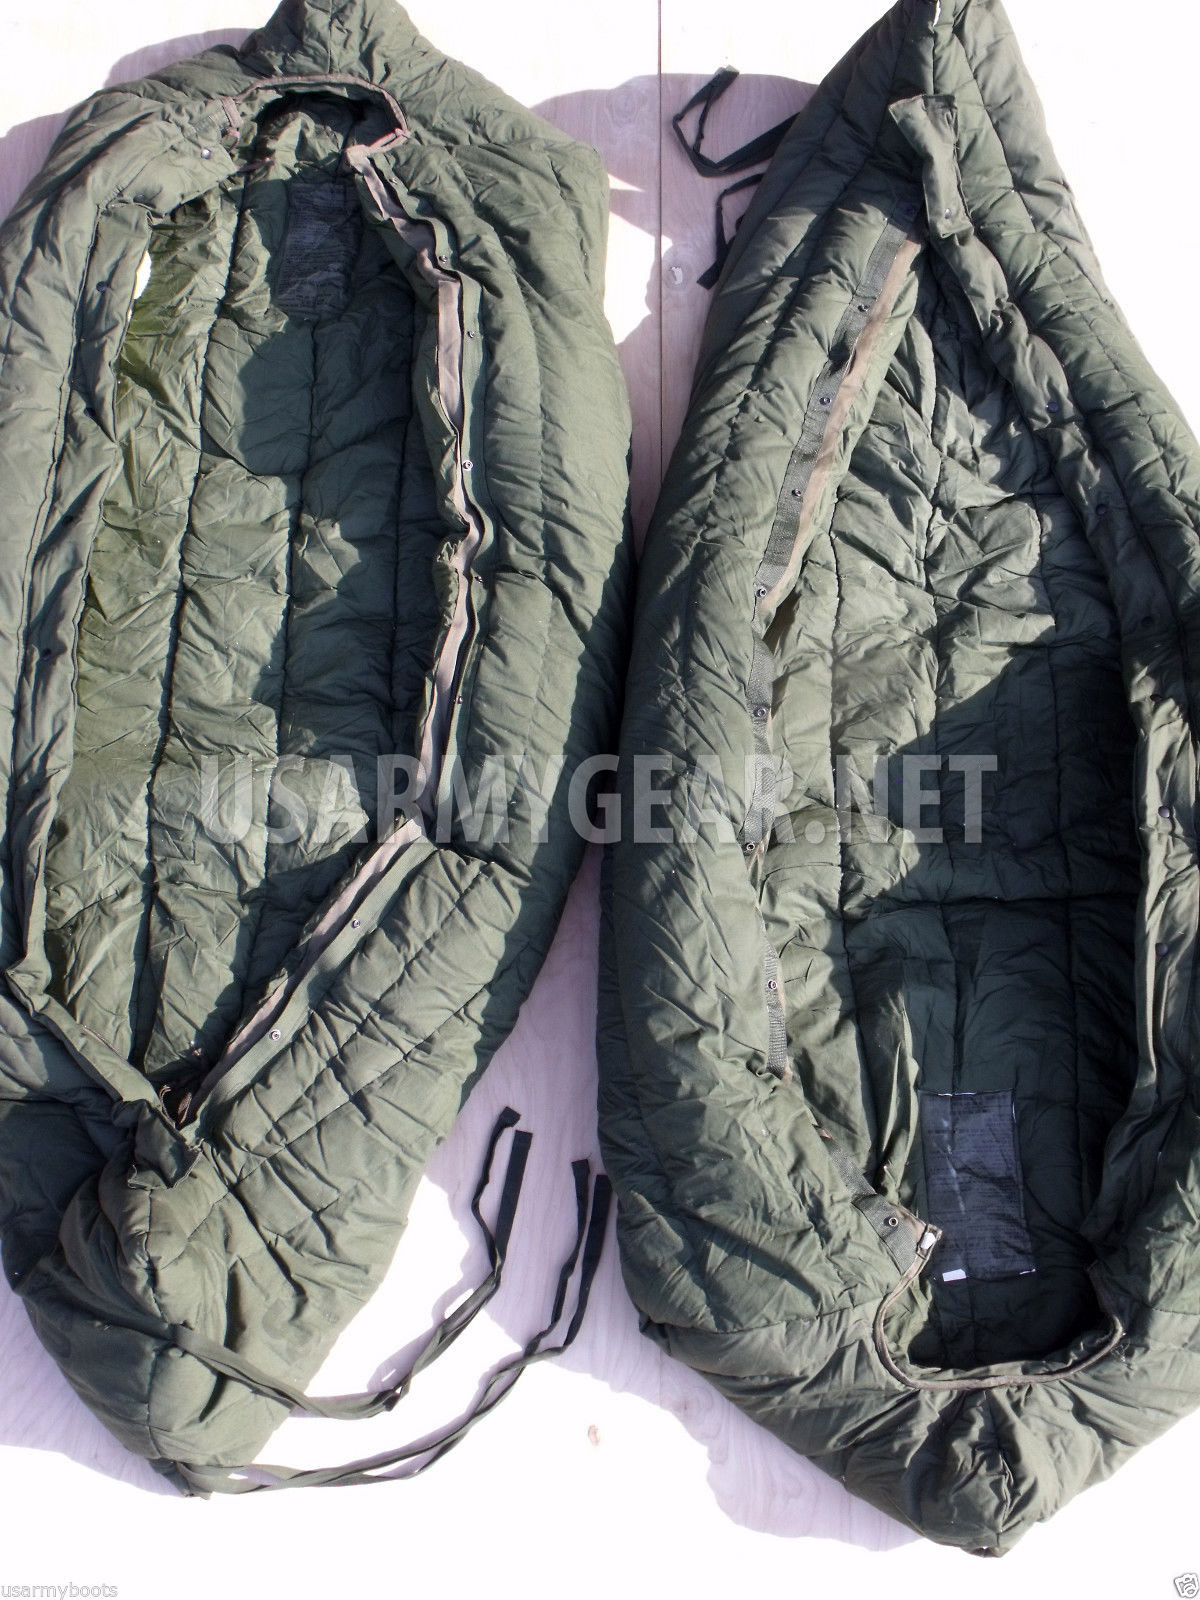 Made In Usa Usmc Army Intermediate Cold Weather Ecw Gi